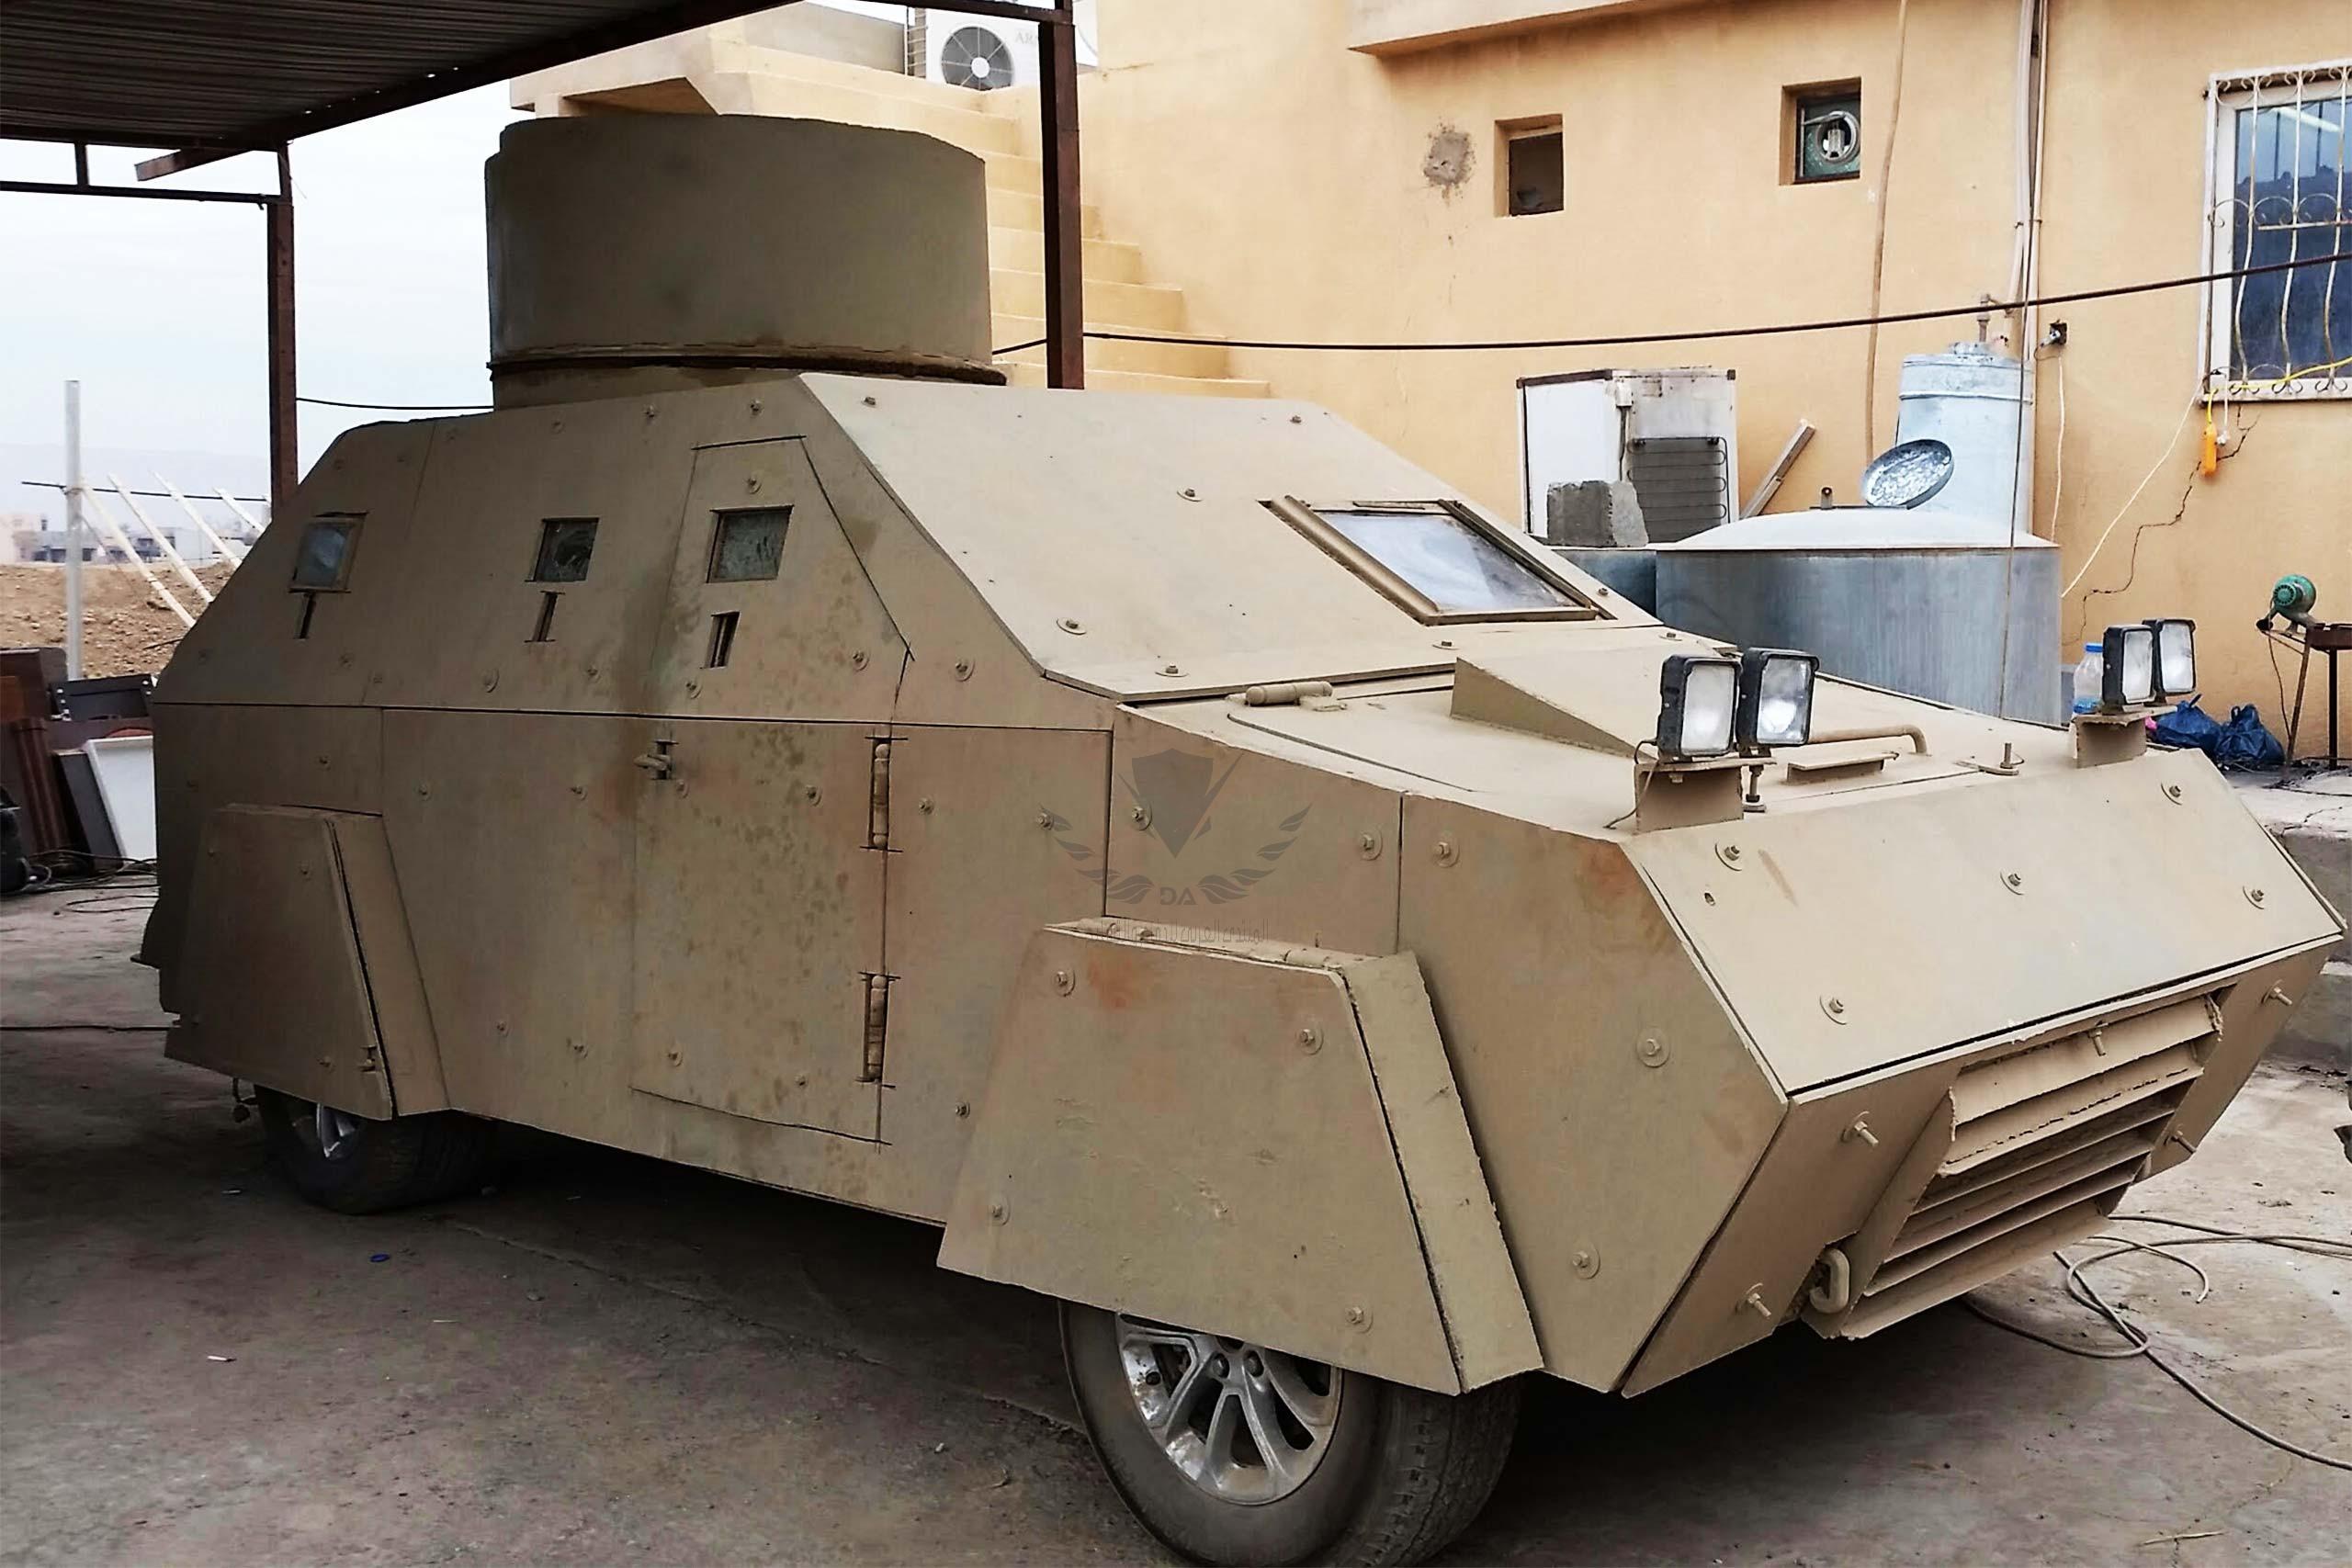 170317-Axe-Dozier-Iraq--armored-jeeps-tease_xnld90.jpg